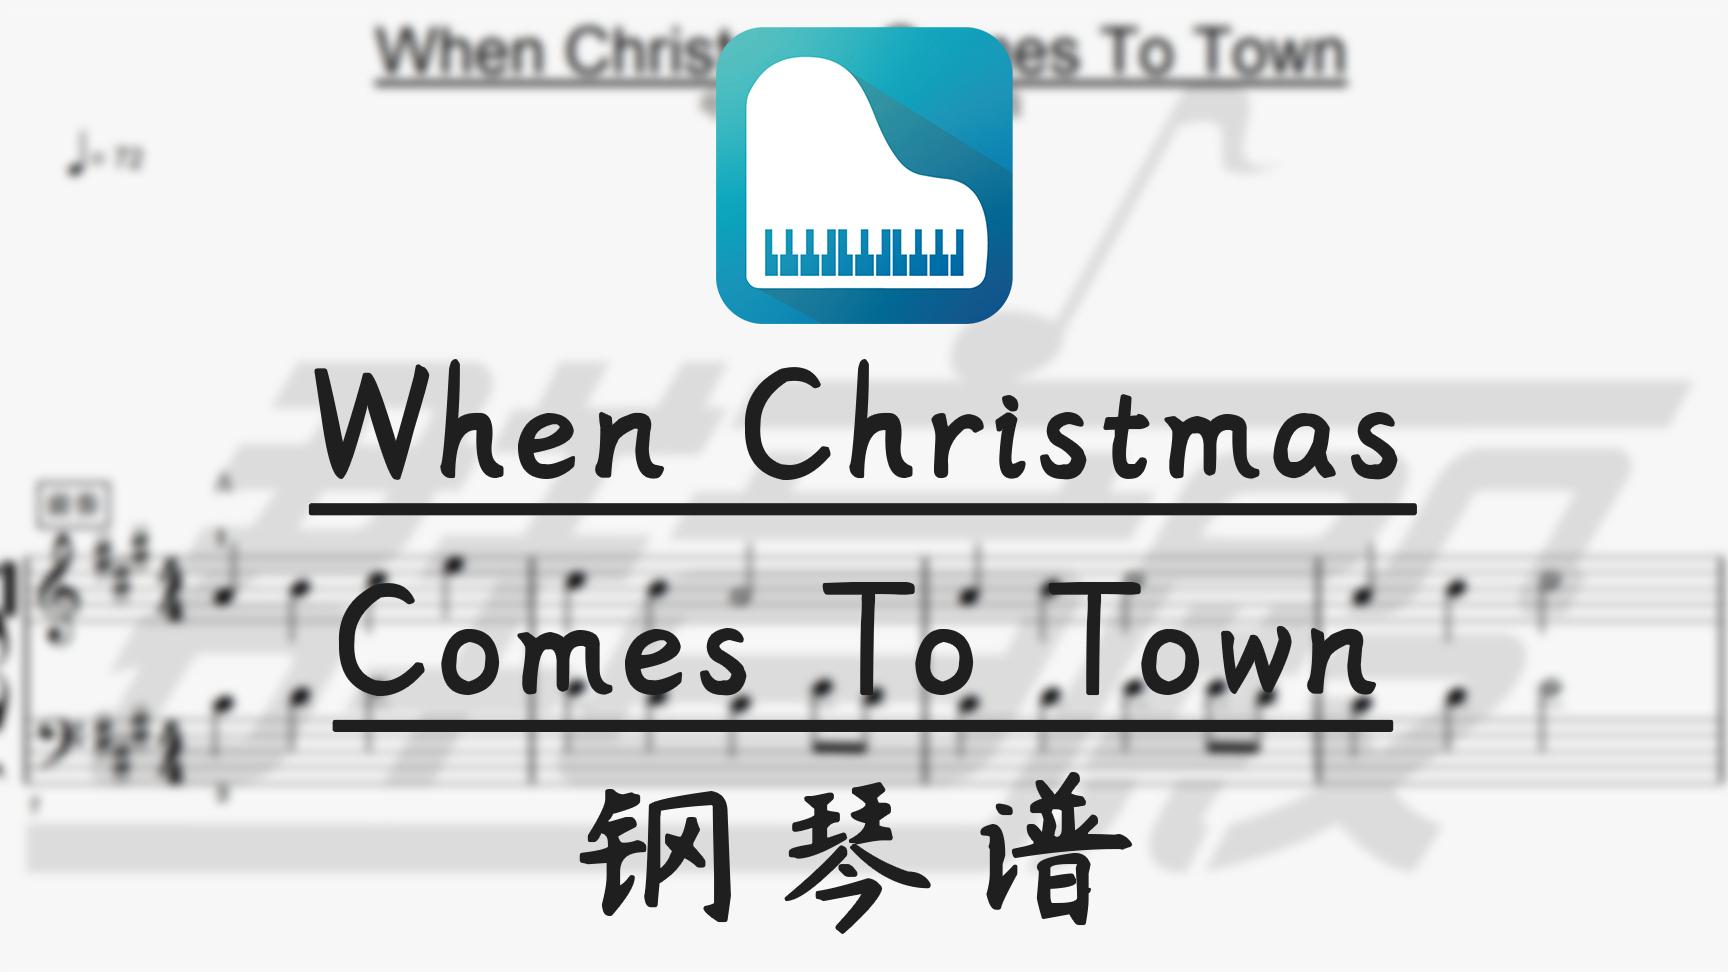 【钢琴谱】When Christmas Comes To Town ( 极地特快 插曲)